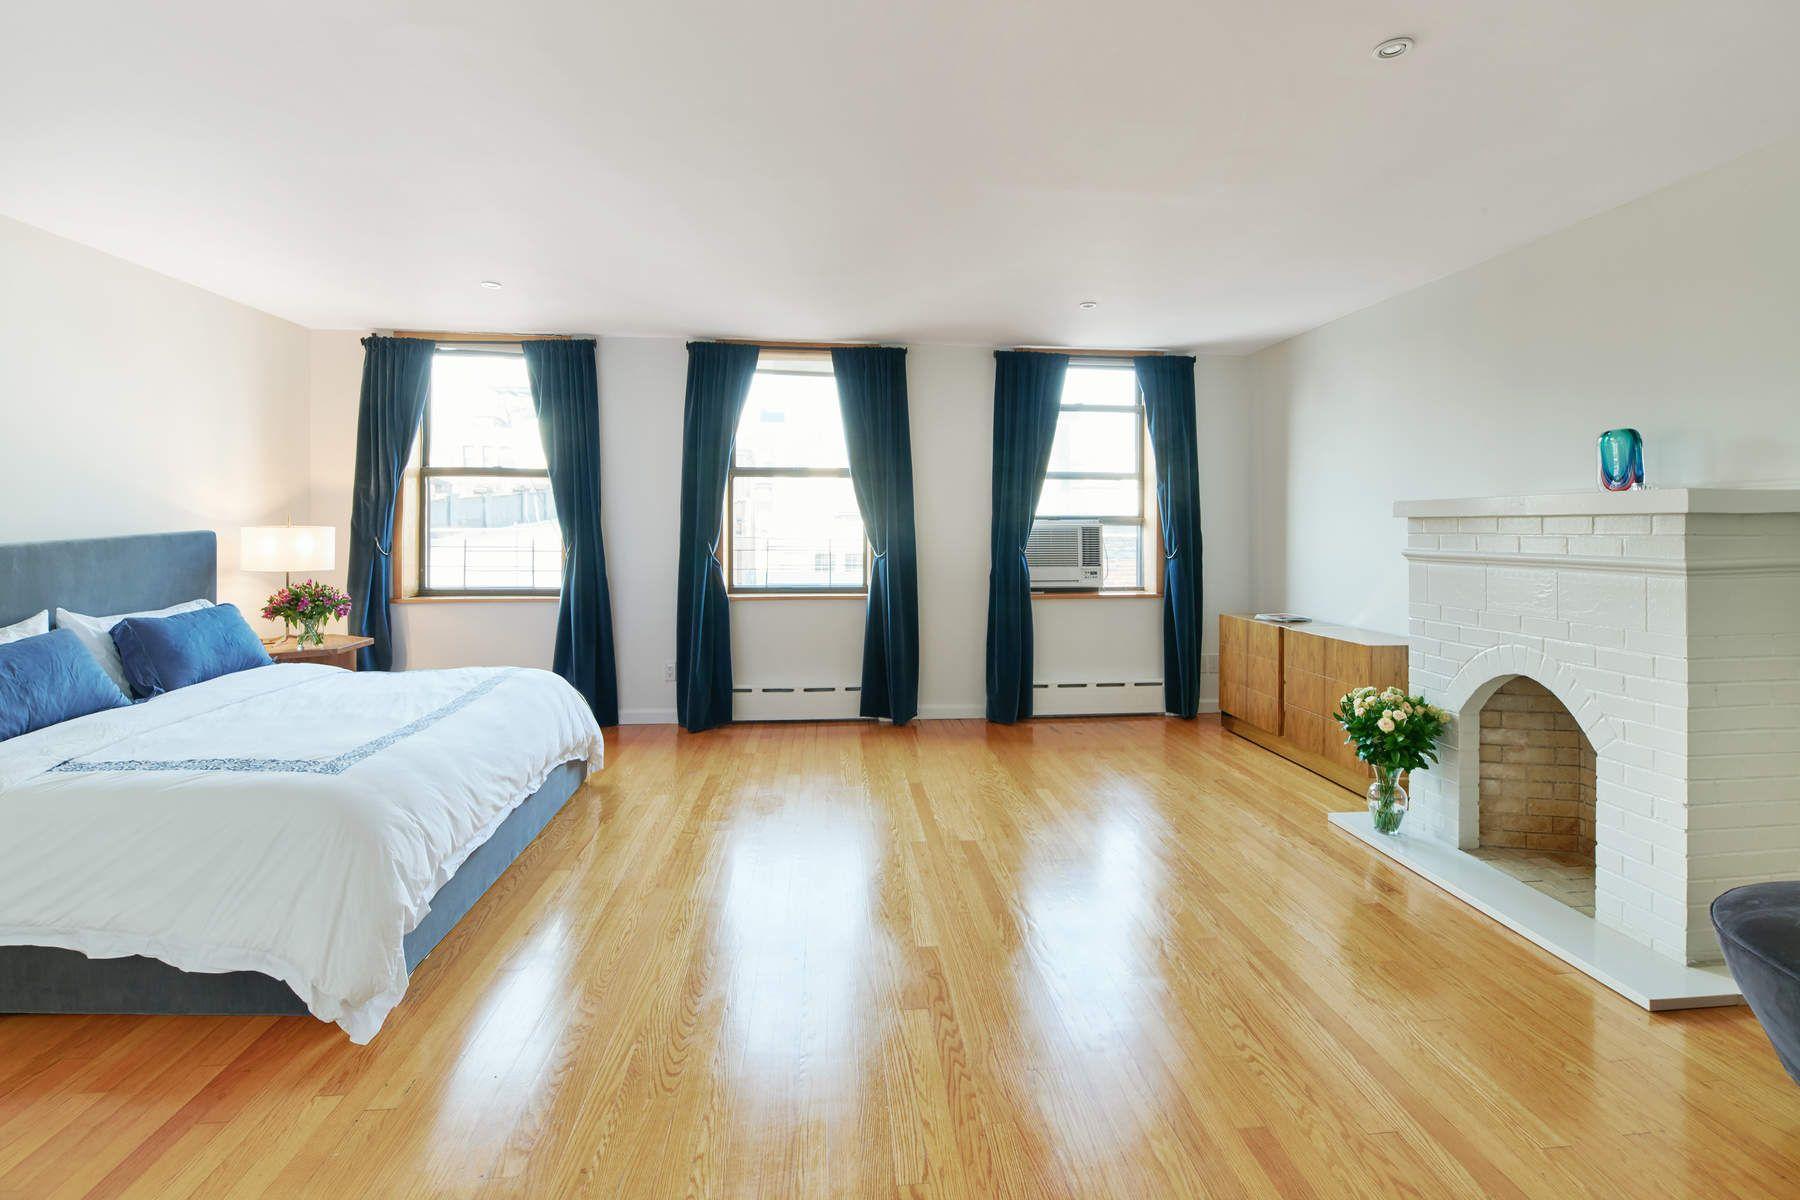 Additional photo for property listing at 83 Mercer Street 83 Mercer Street Residential Unit New York, New York 10012 United States